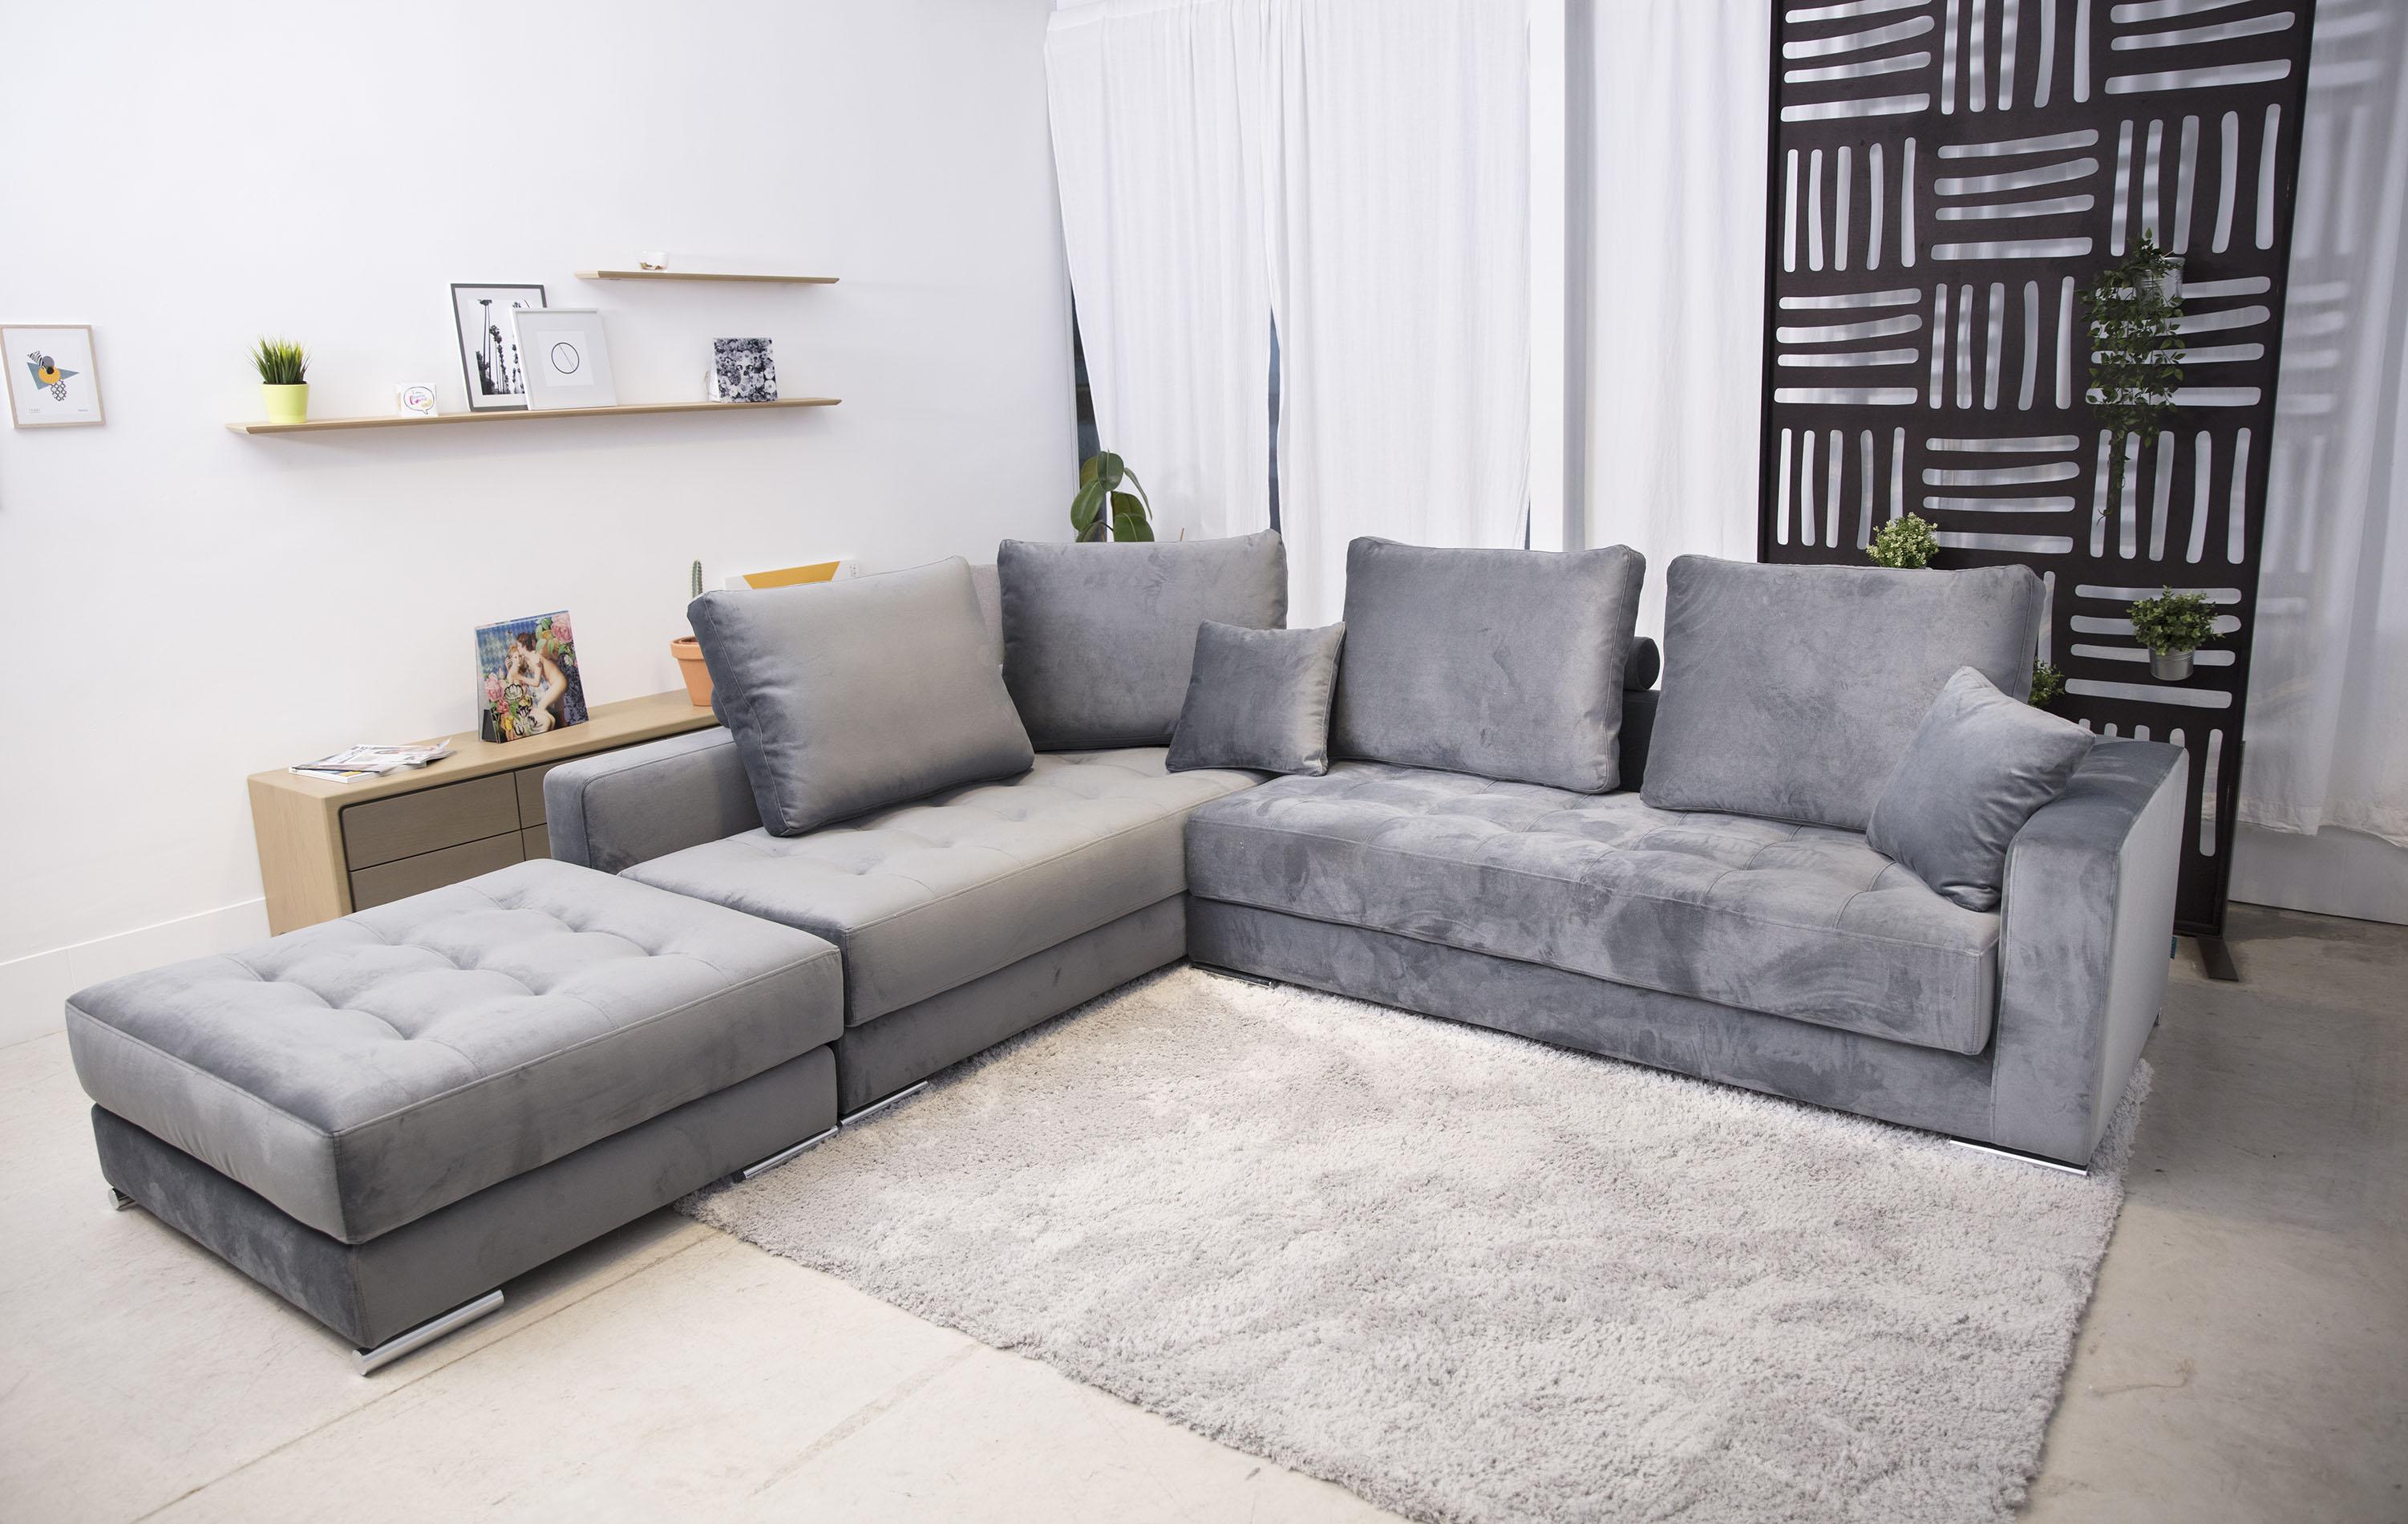 grey velvet corner sofa stylish with silver legs.